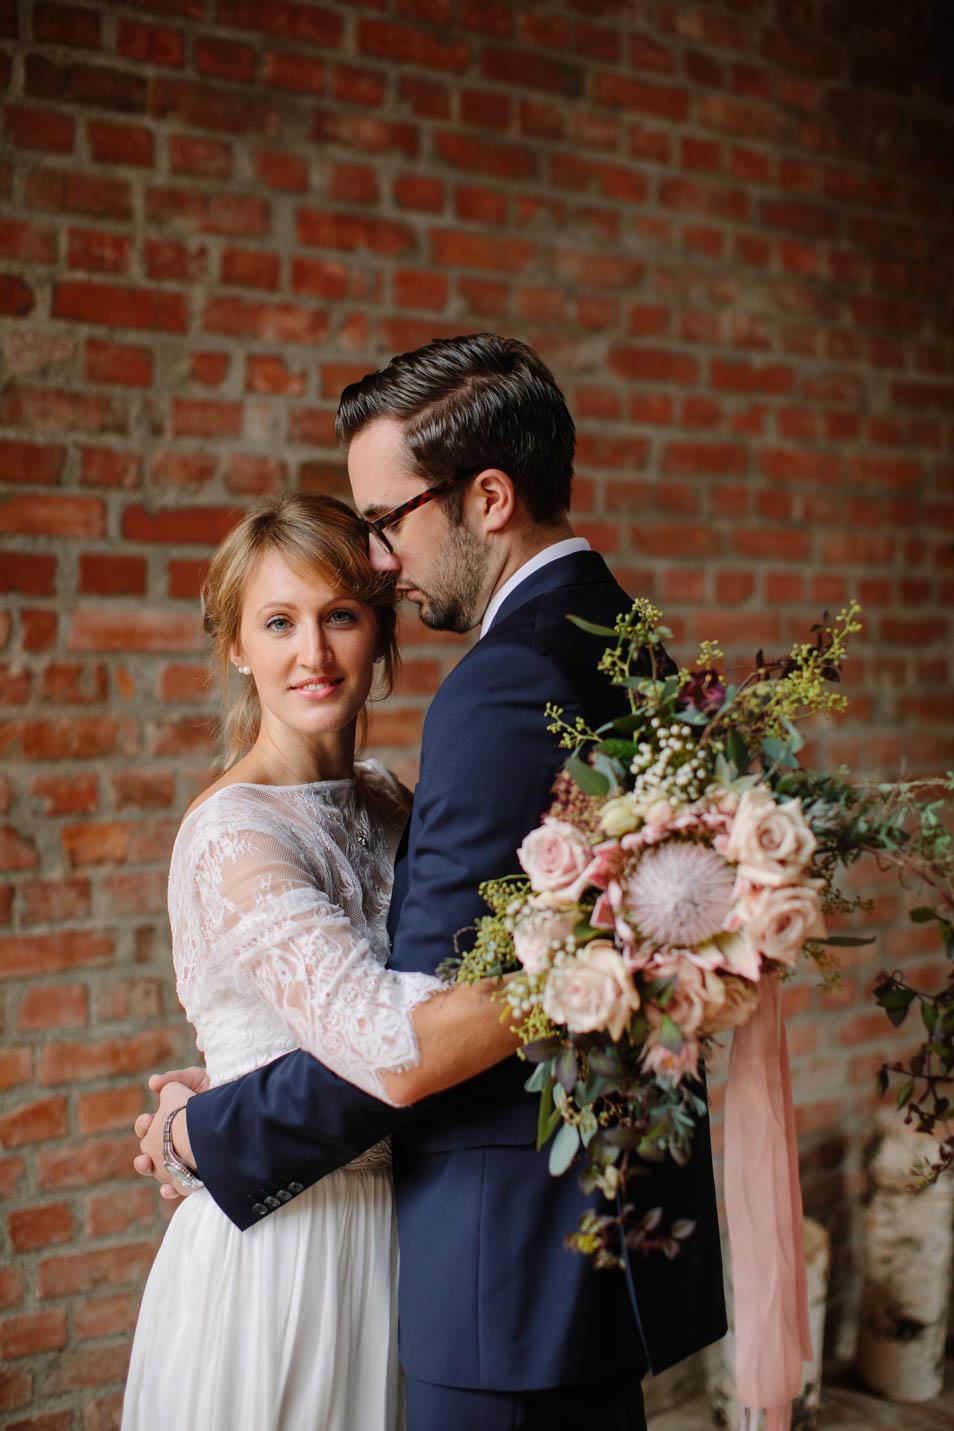 Brautstrauss in Rosetönen